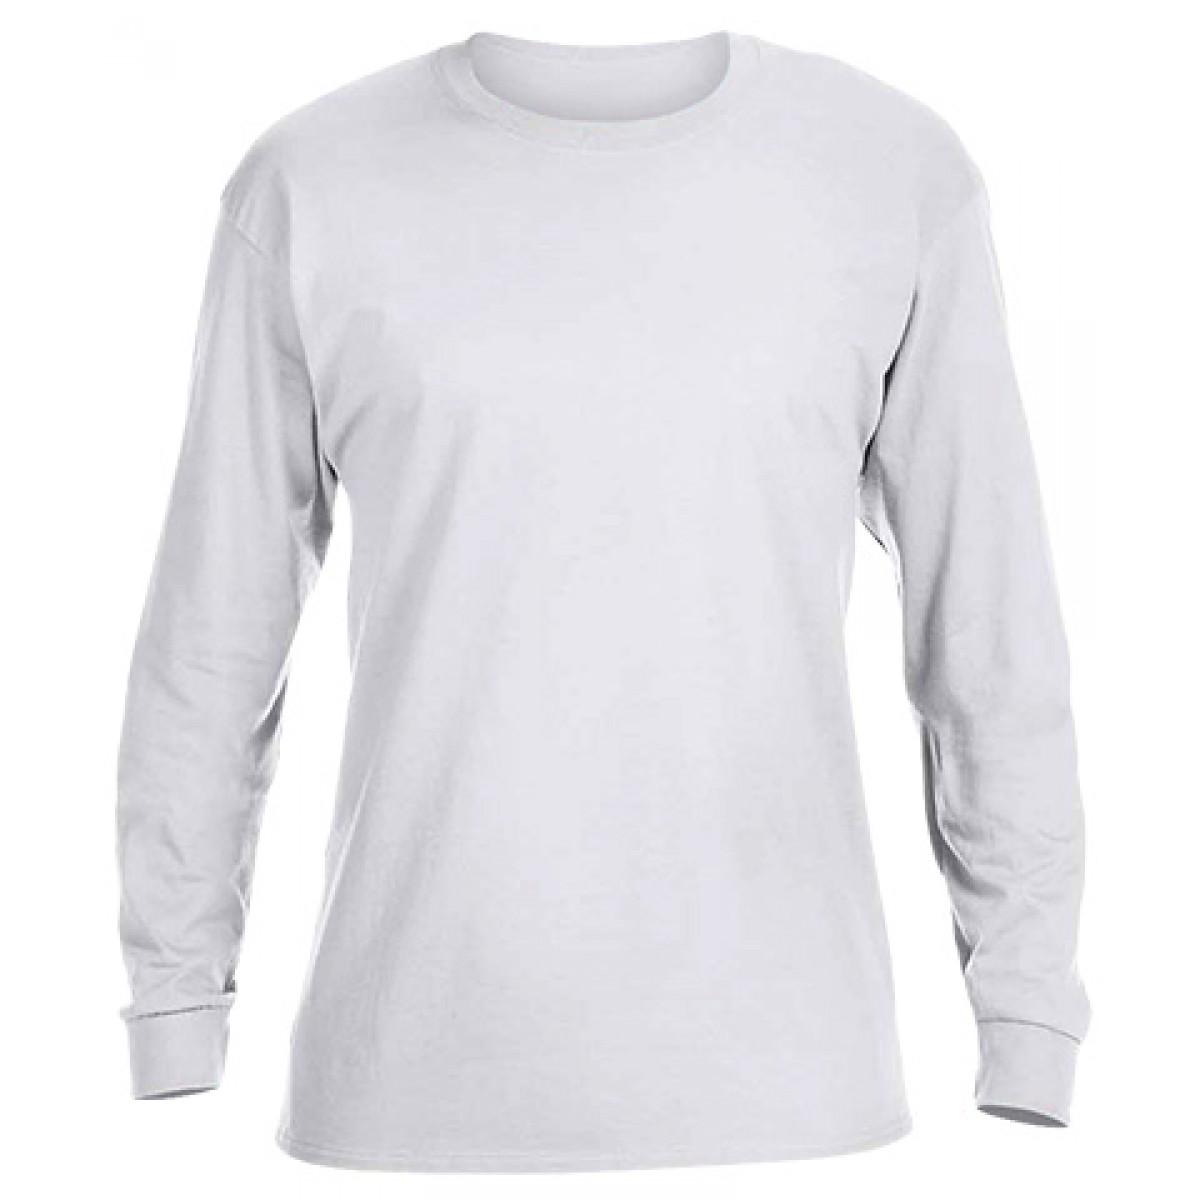 Ultra Cotton Long-Sleeve T-Shirt-White-YS